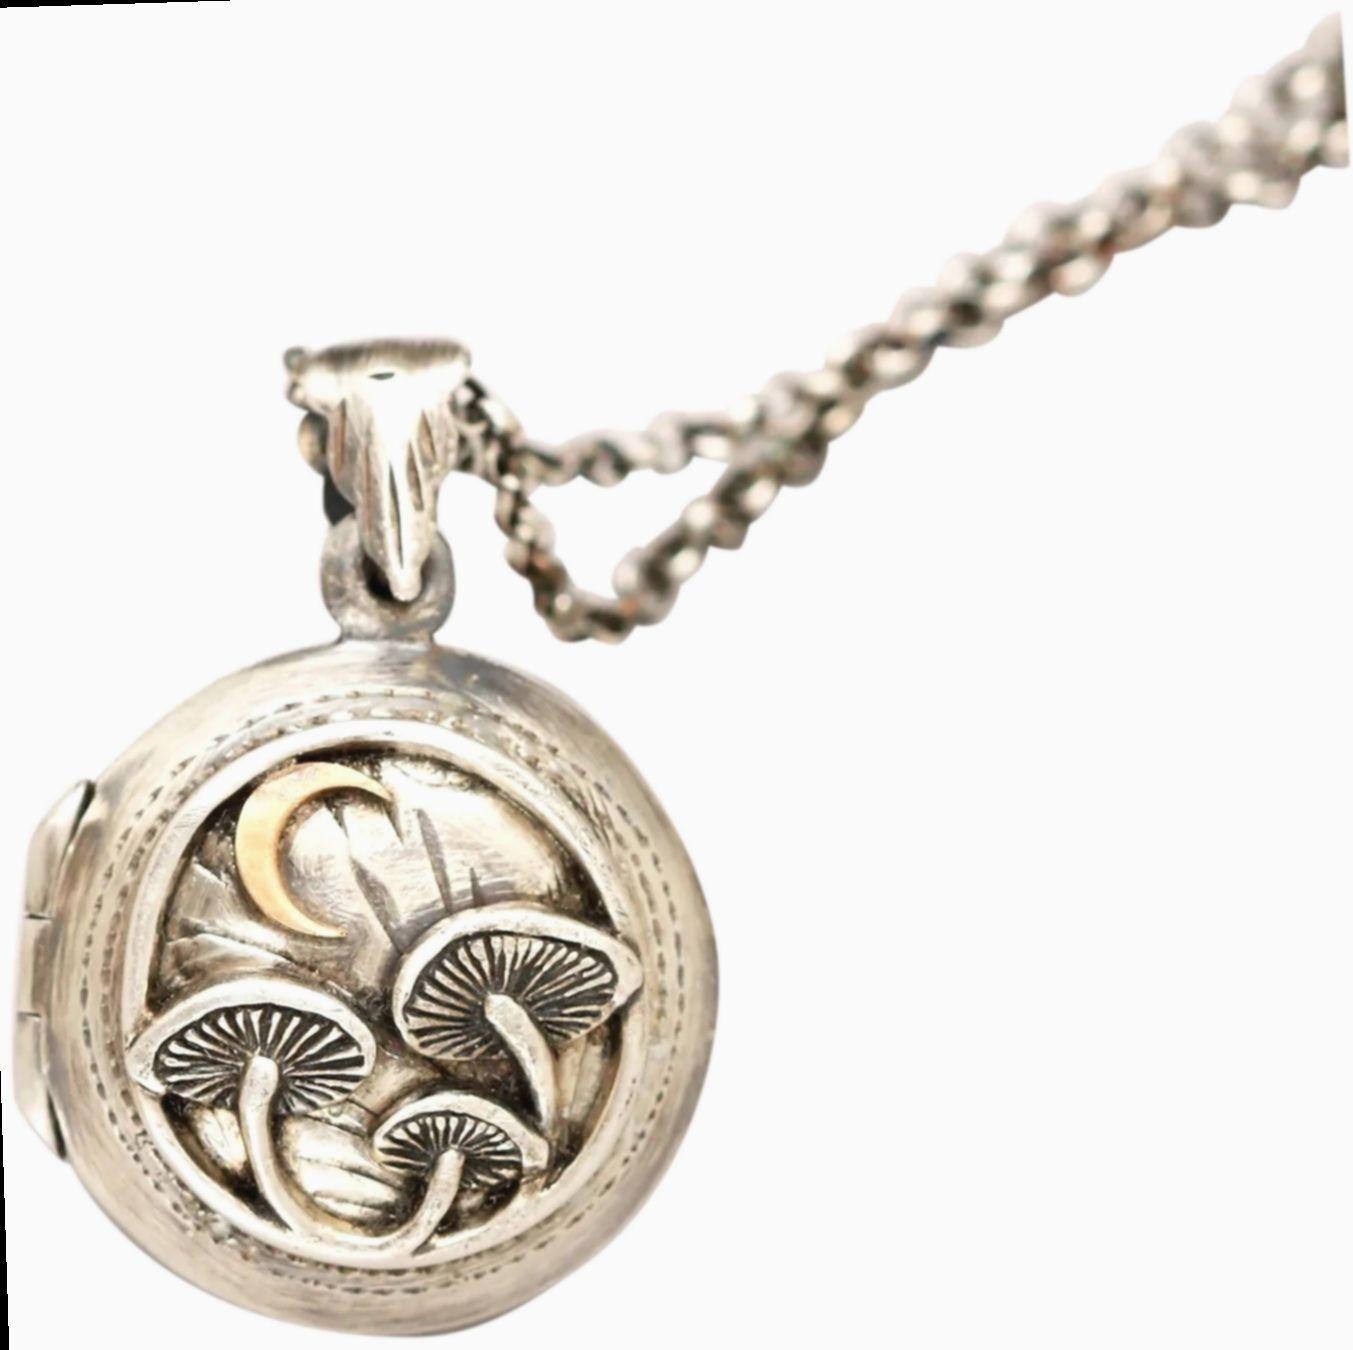 ✔ Jewelry Necklace Pendant Sterling Silver #potd #preciousjewellery #photooftheday